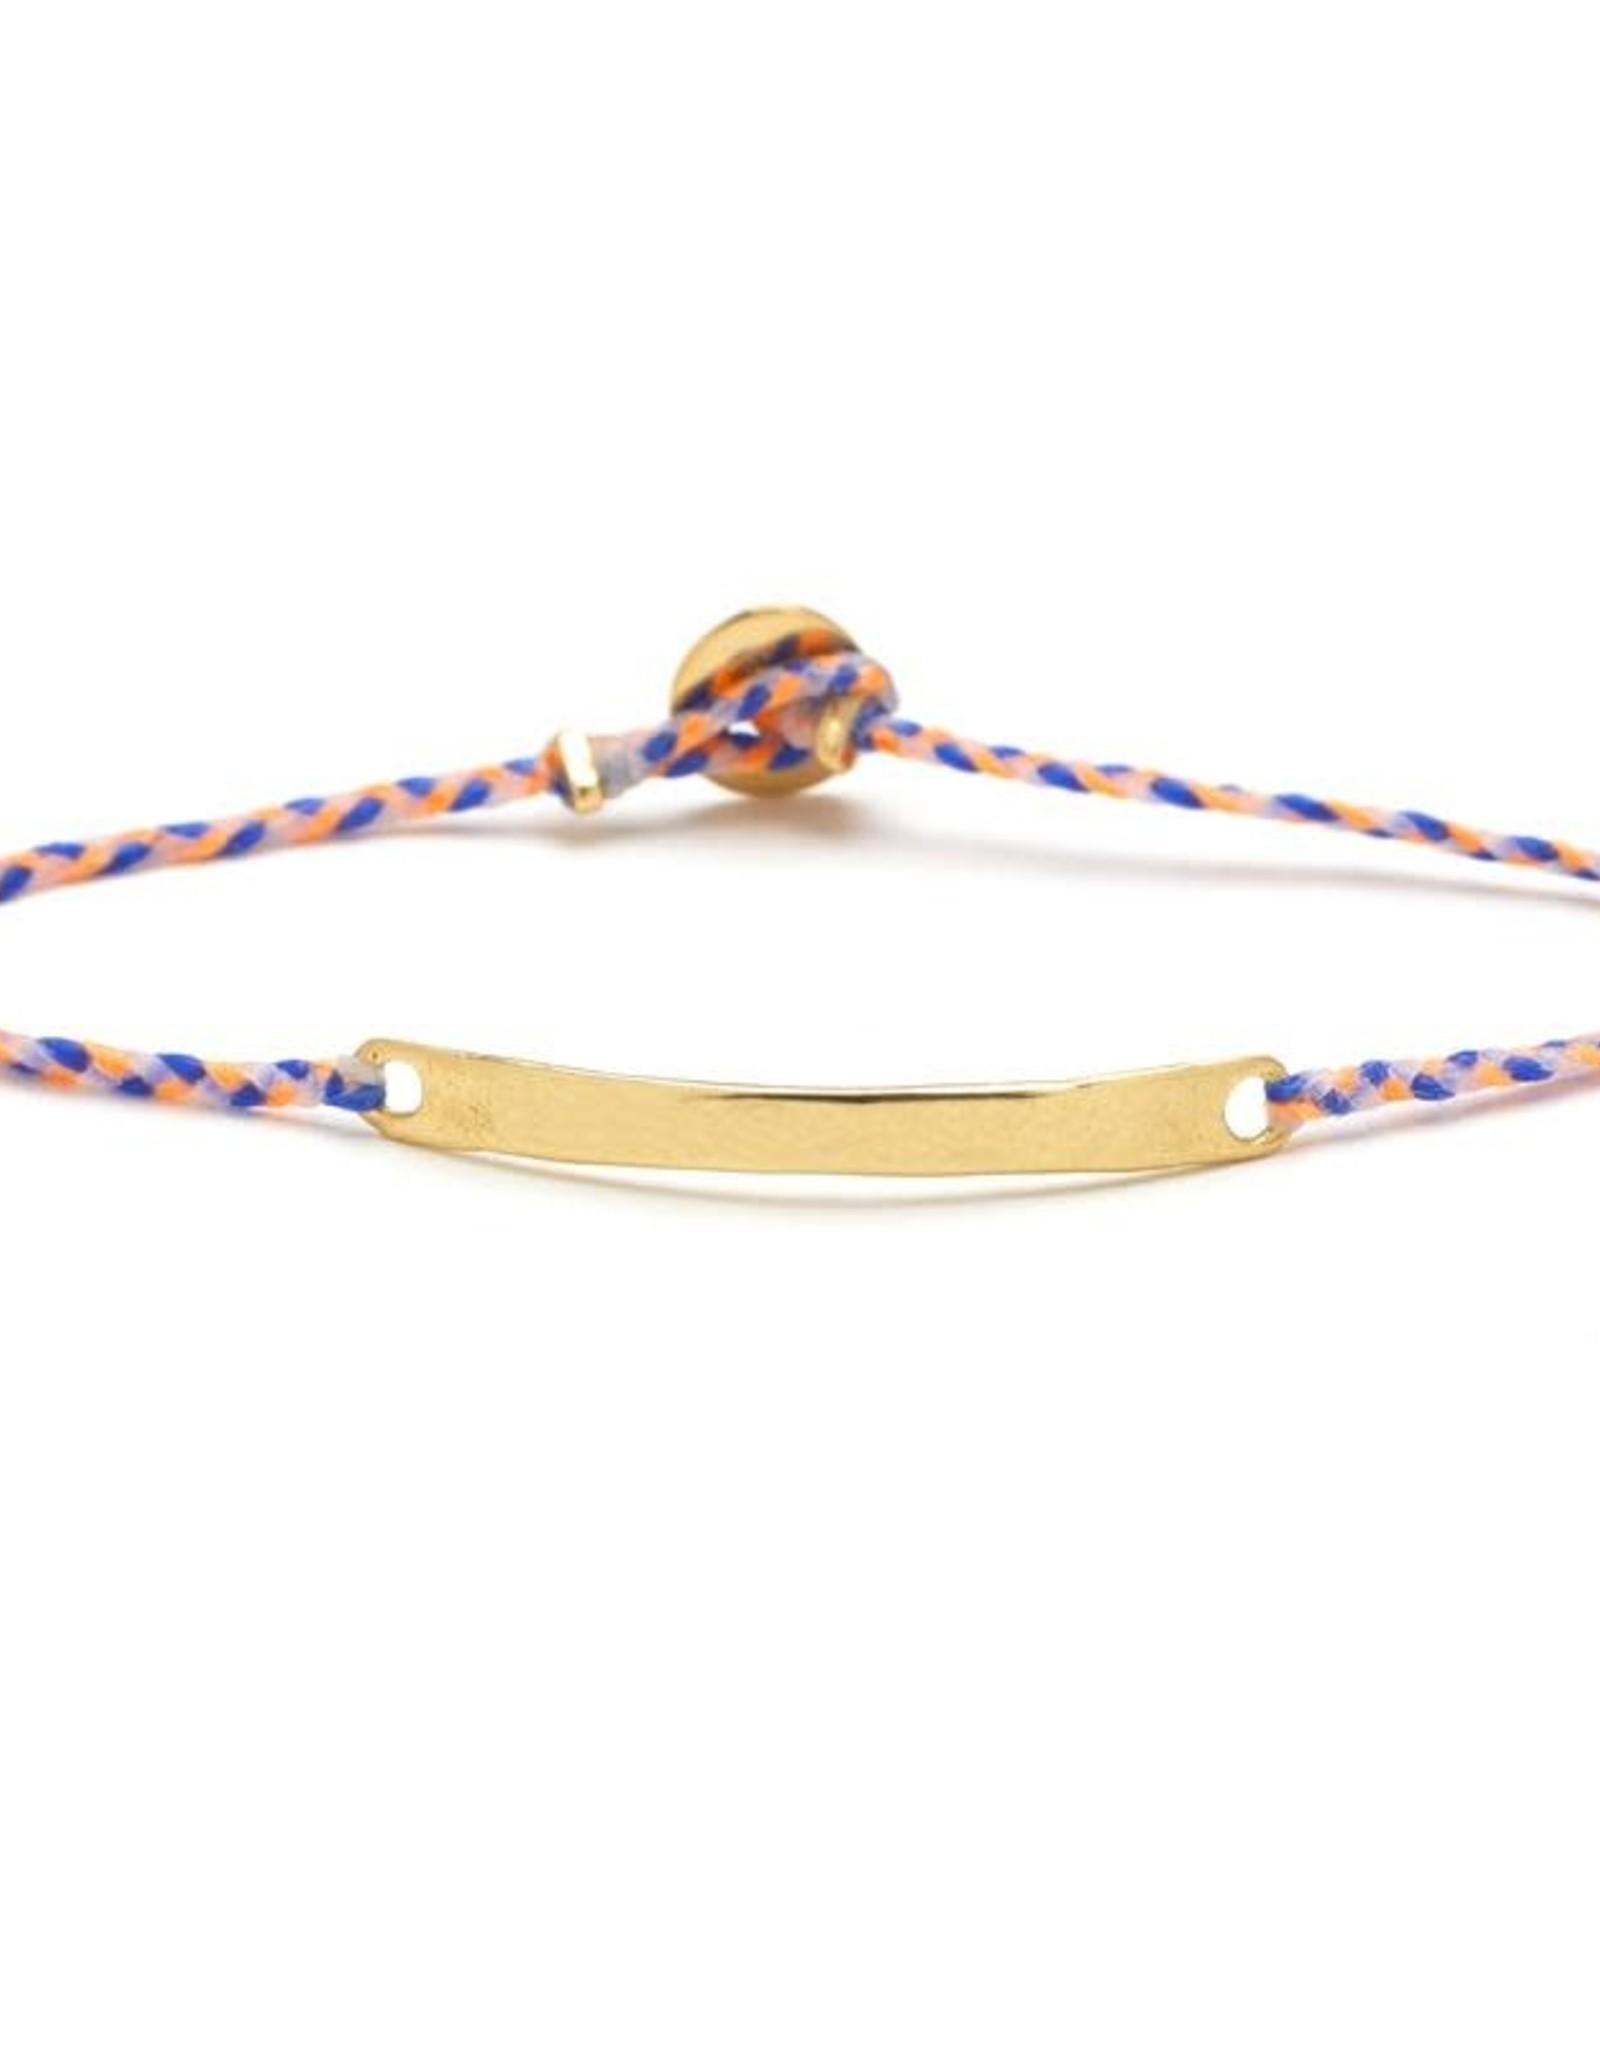 Scosha Signature ID Bracelet - Neon Peach + Royal Blue + White